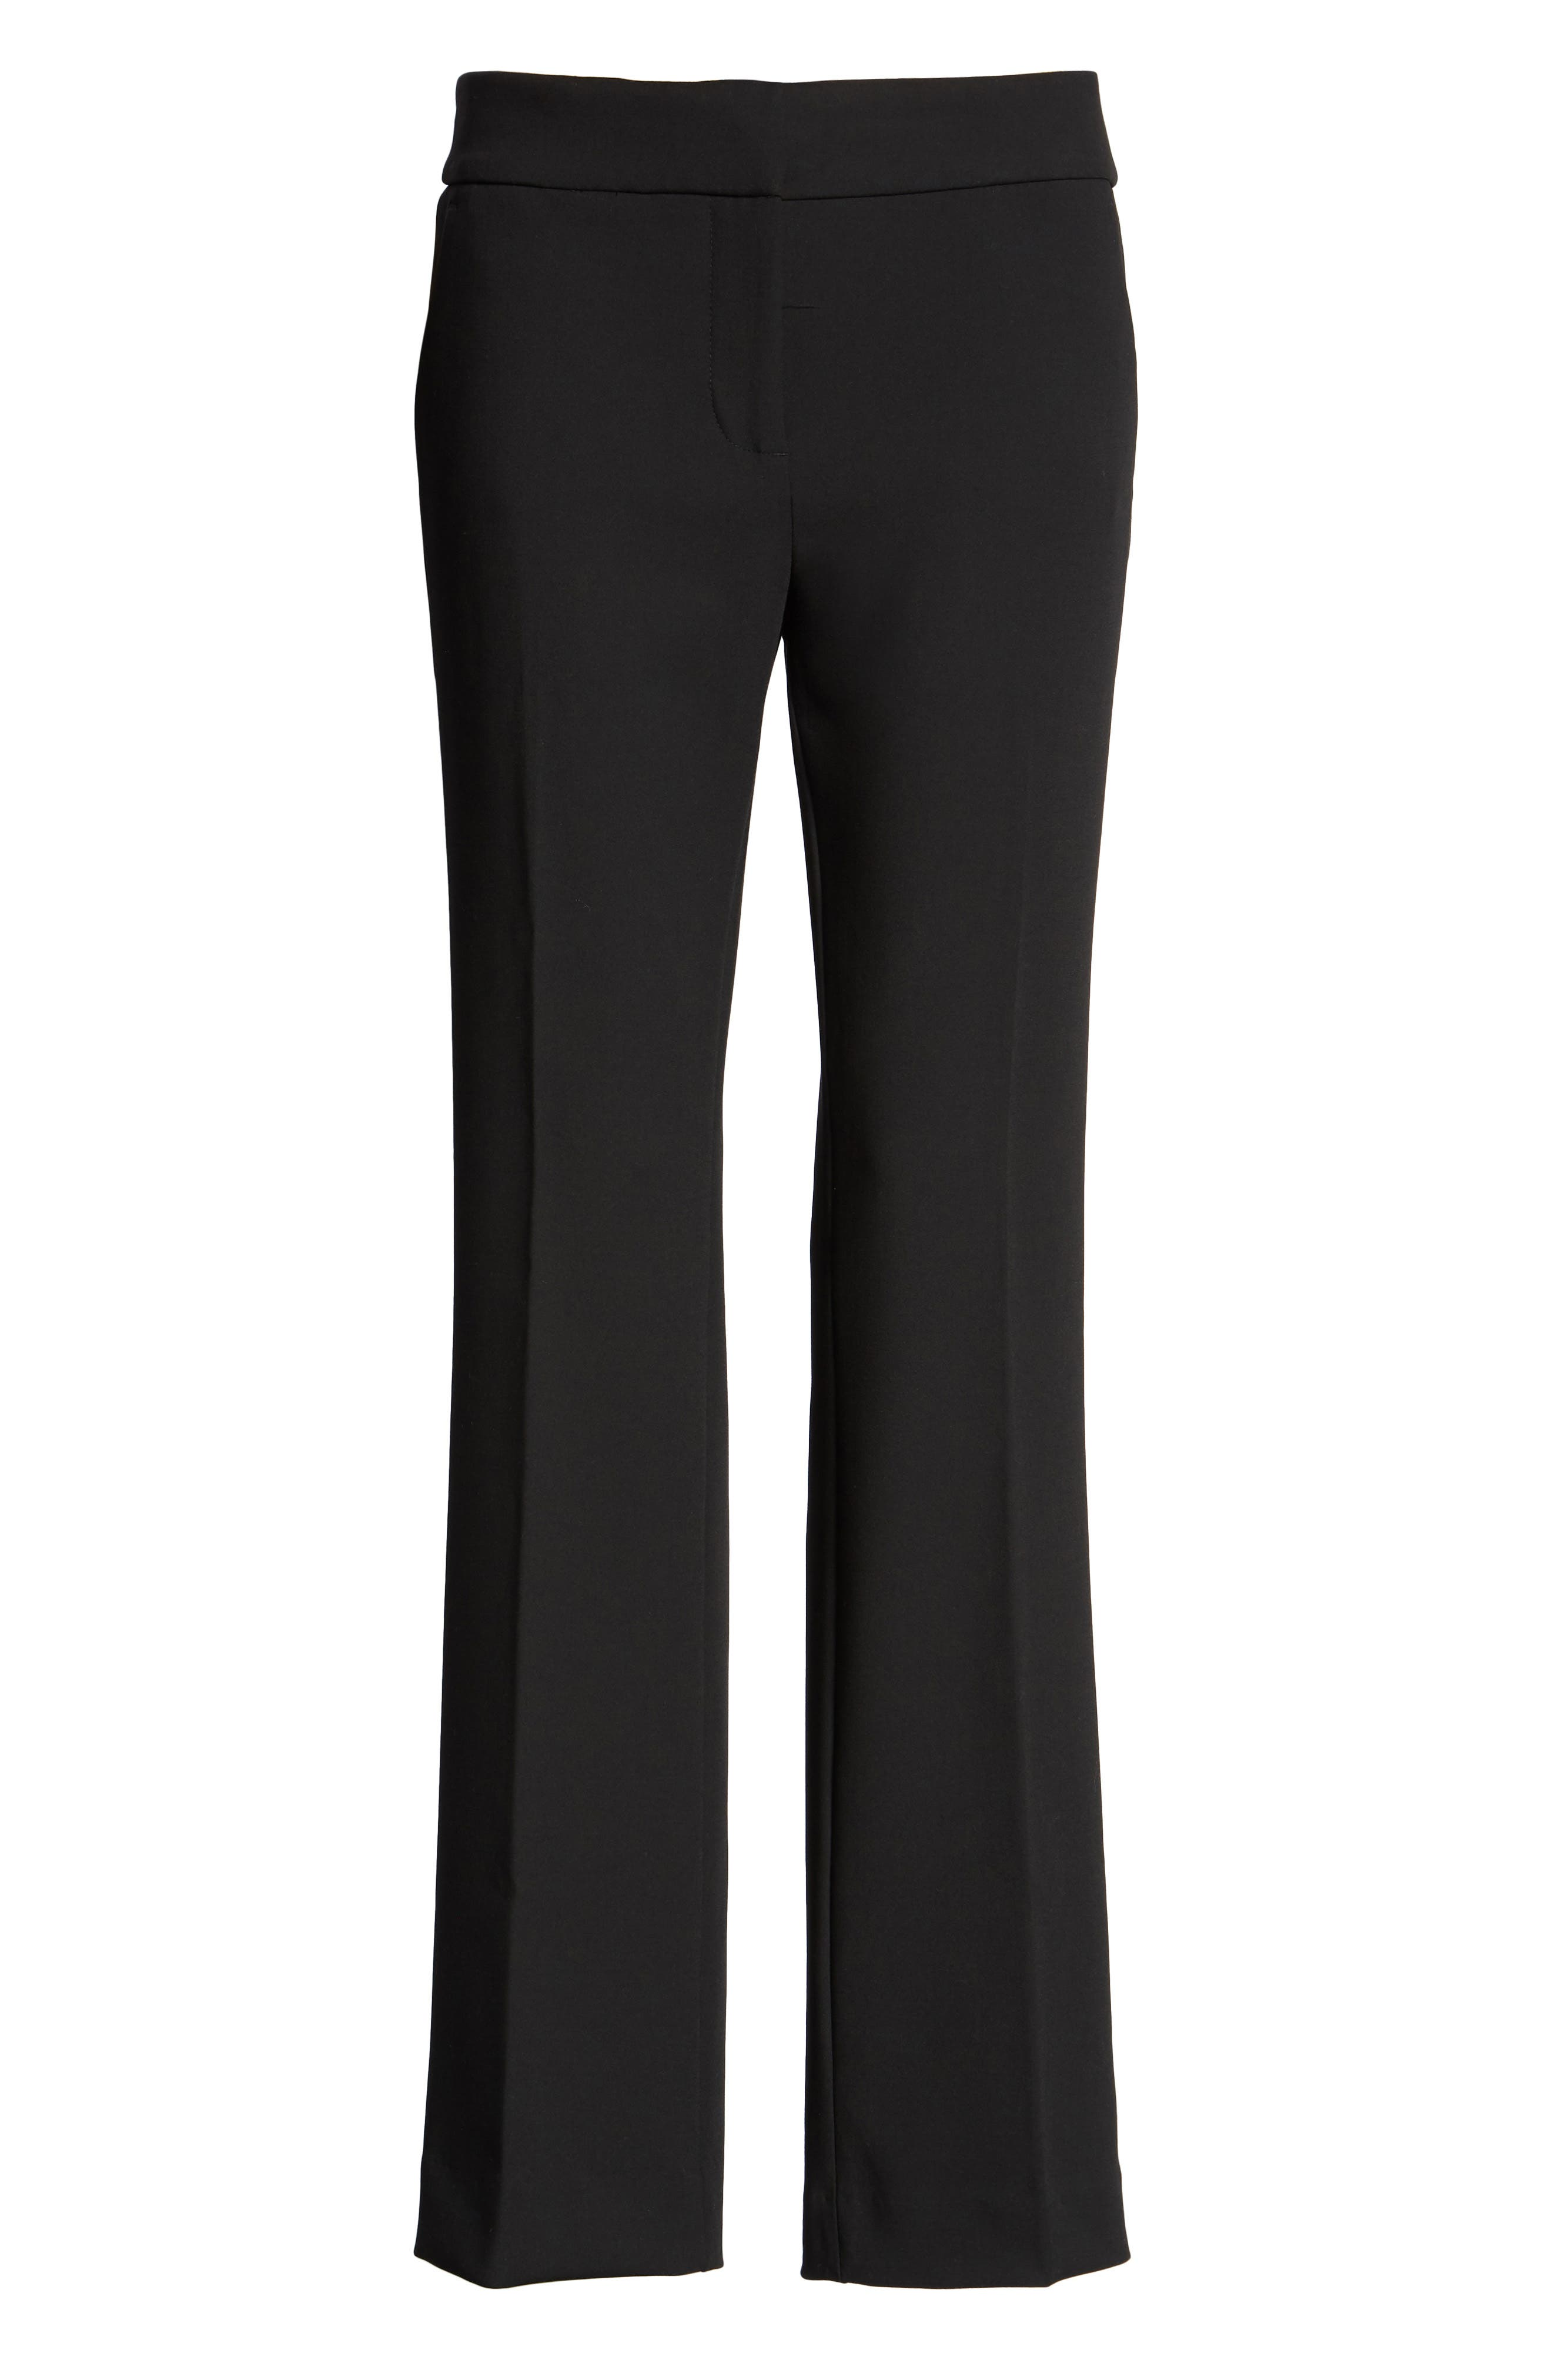 Edie Full Length Trouser in Four-Season Stretch,                             Alternate thumbnail 6, color,                             001